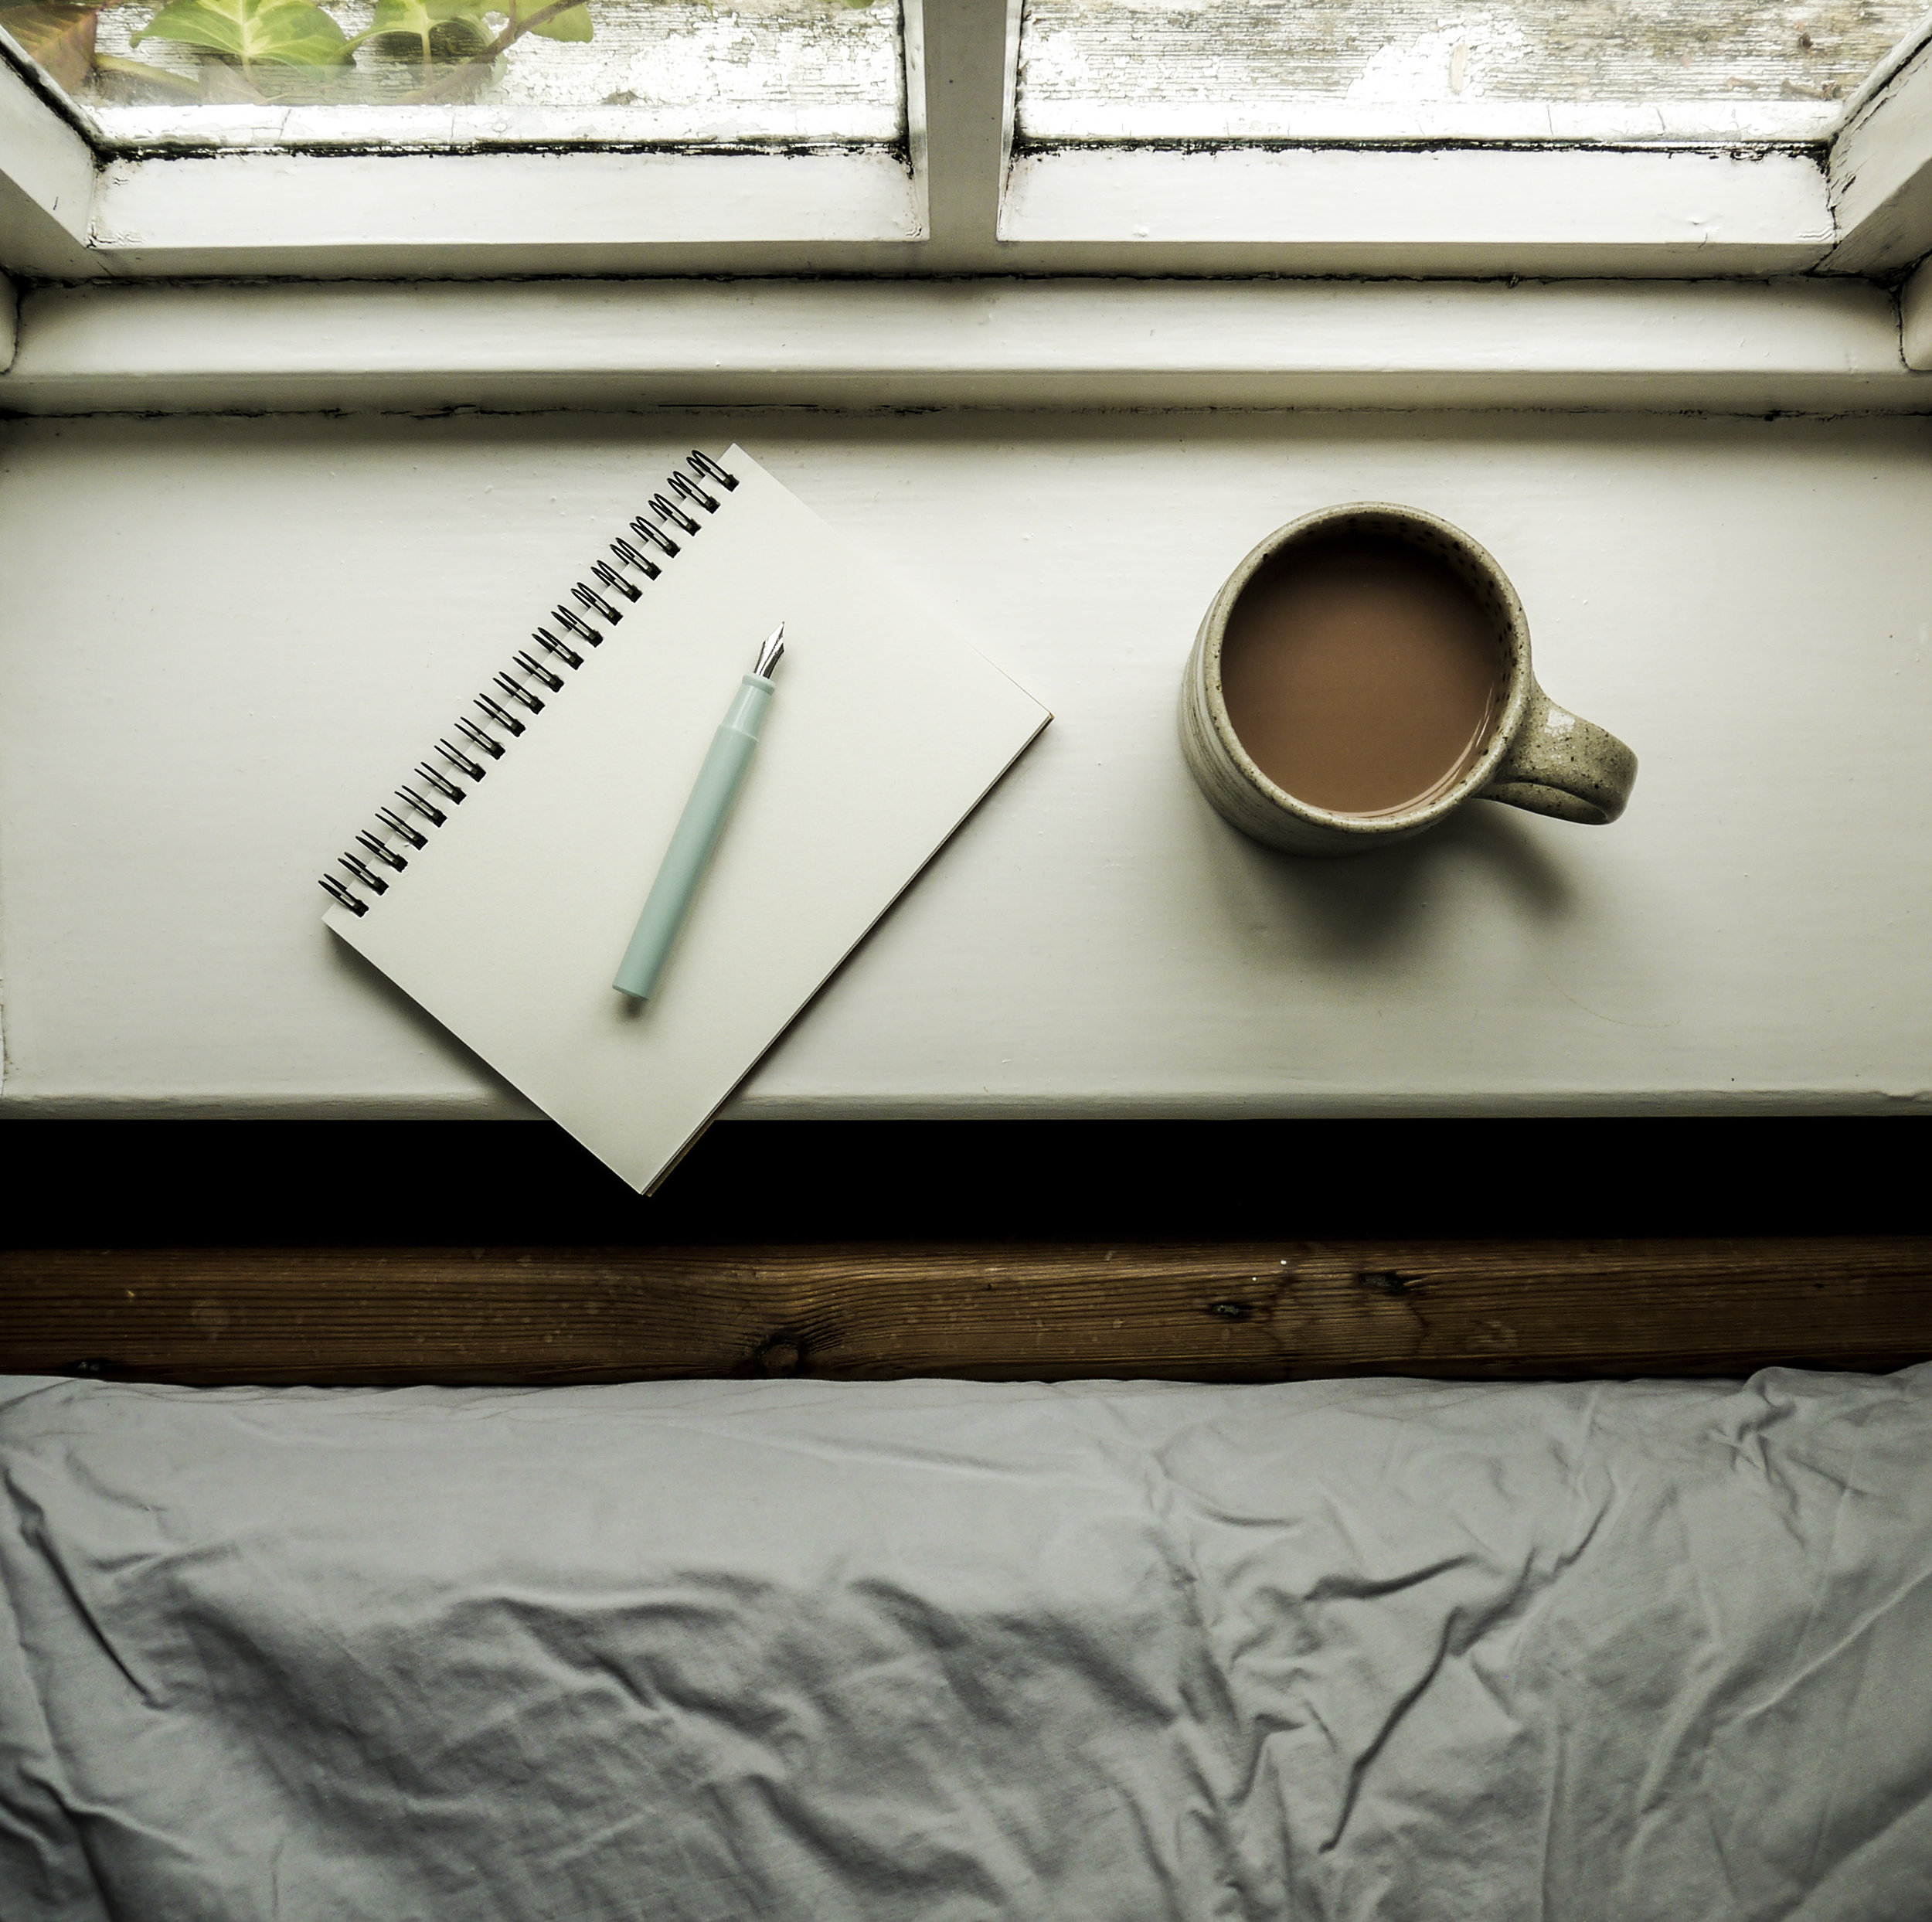 building a routine around creative energy